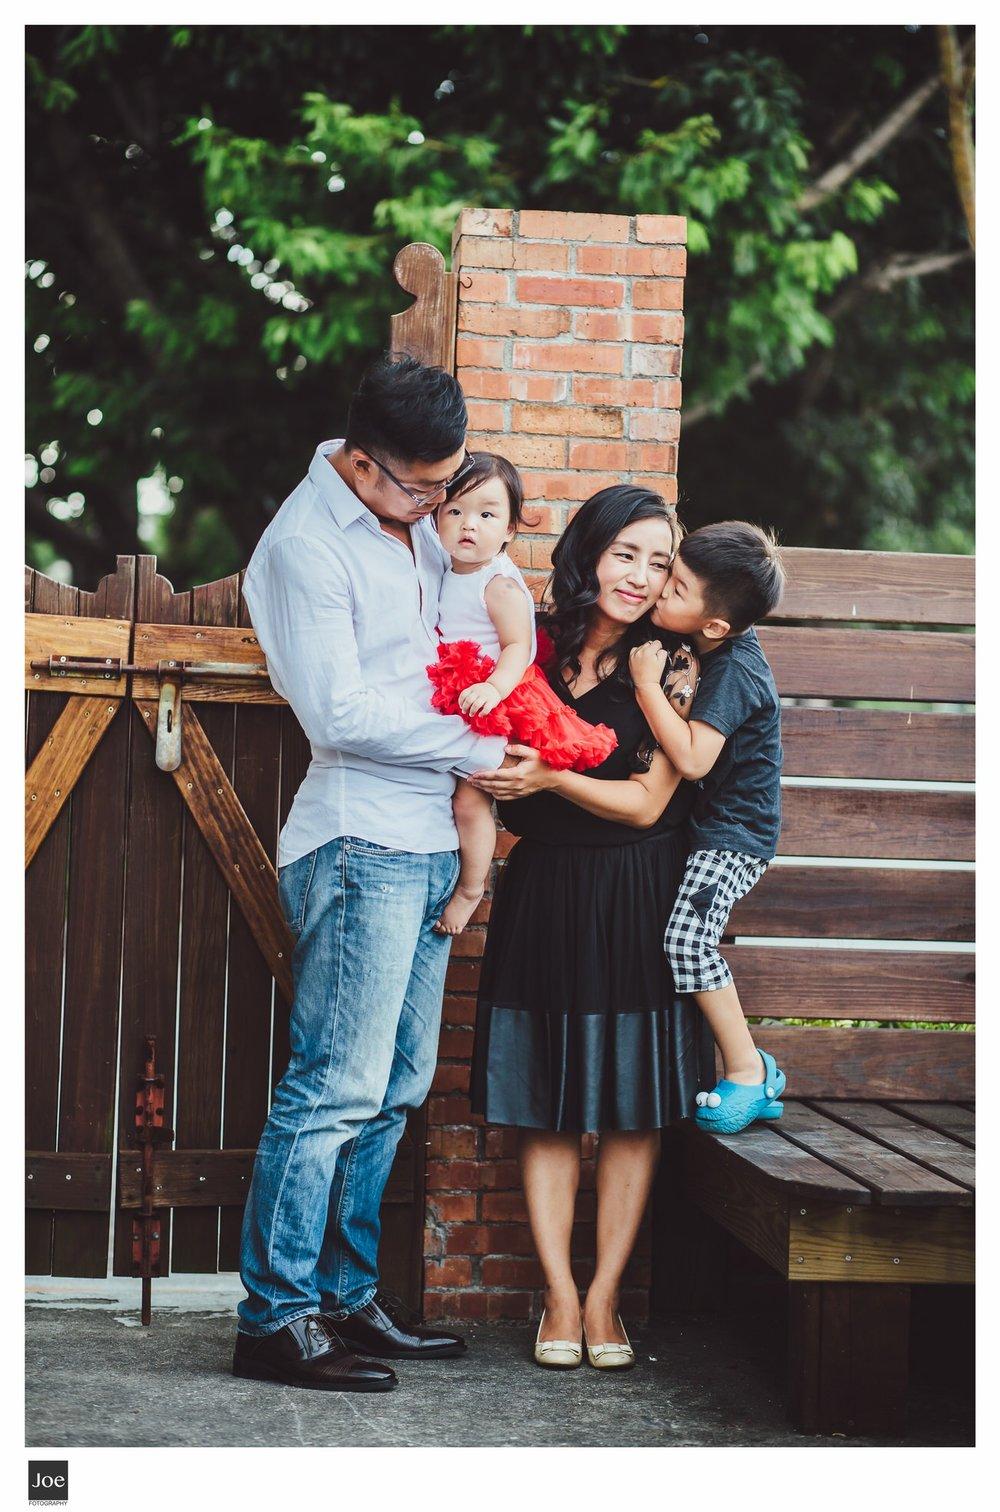 joe-fotography-family-photo-pepper-salt-bowtie-027.jpg